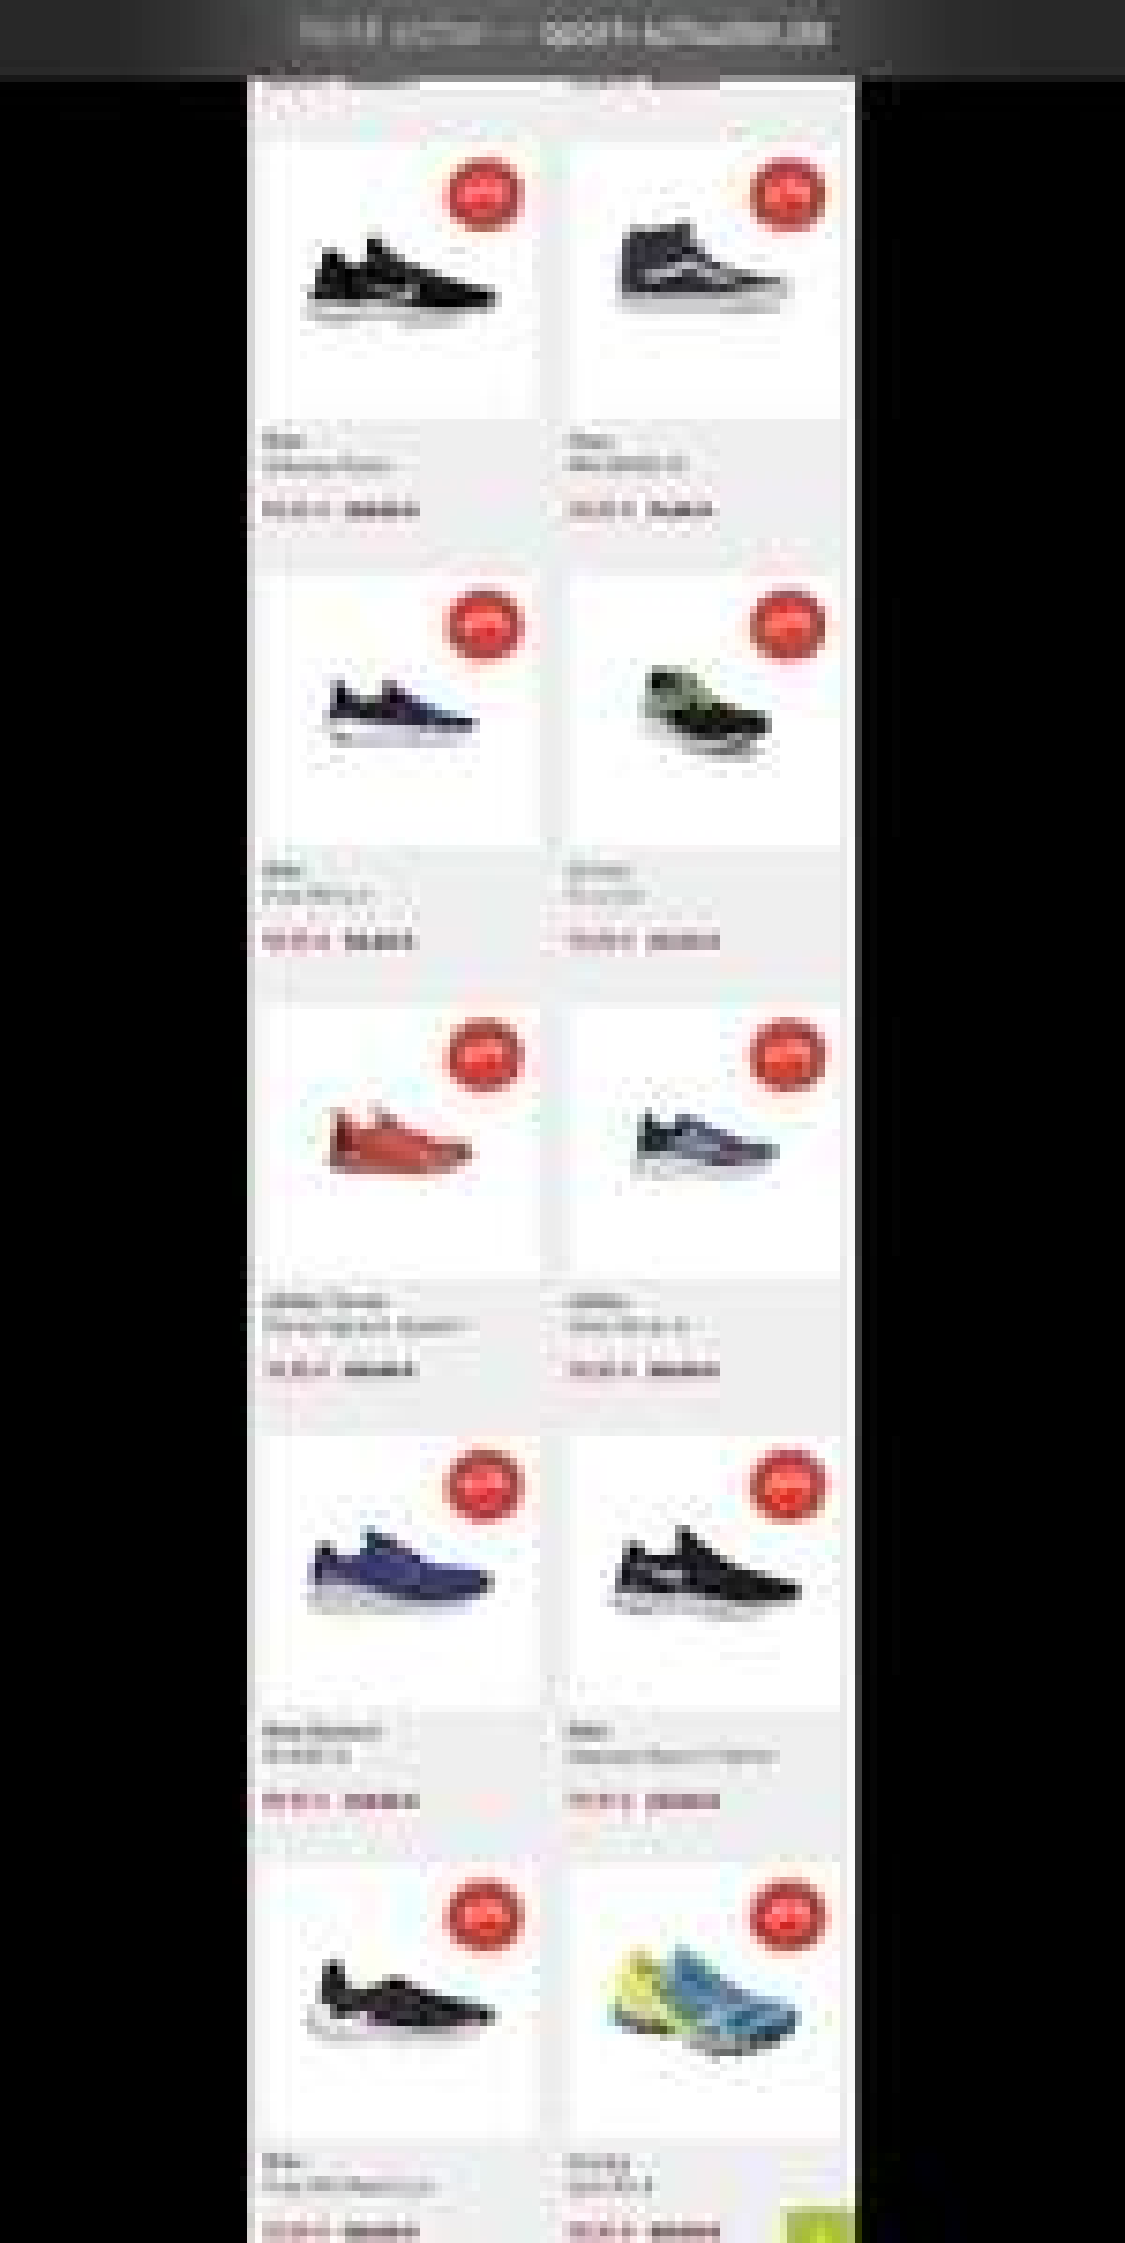 Laufschuhe, zB Nike Free ab 50€